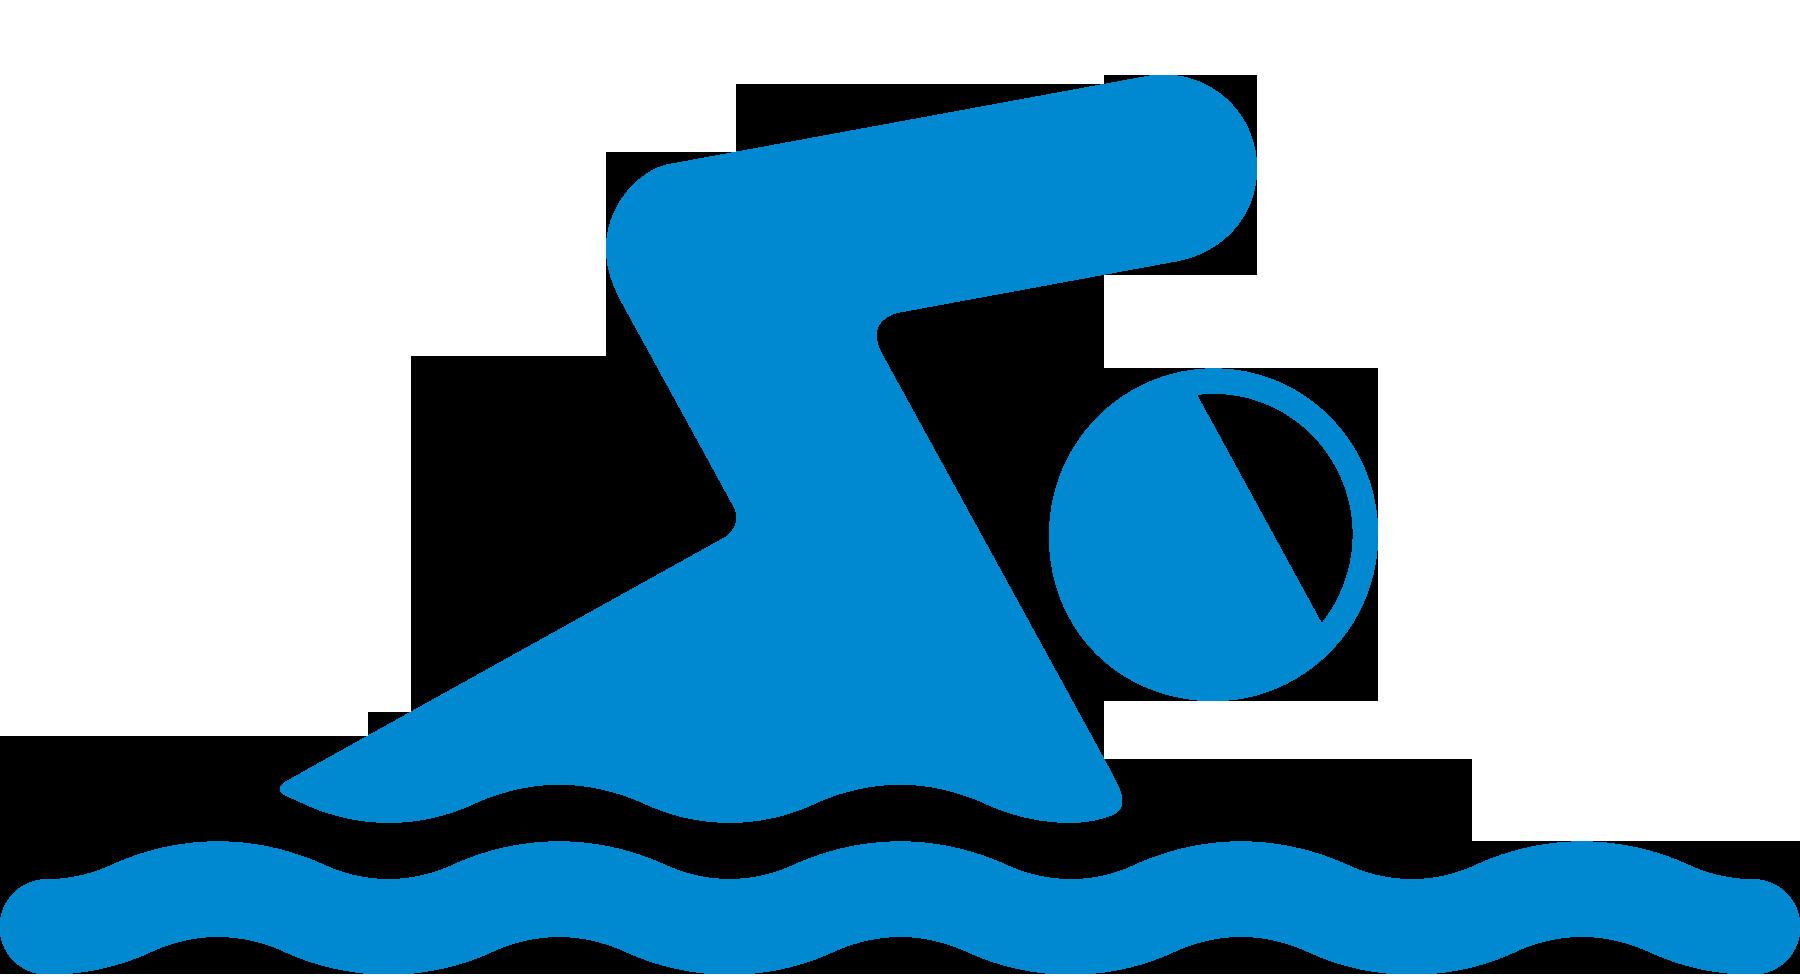 1800x977 Aquatics Amp Swimming